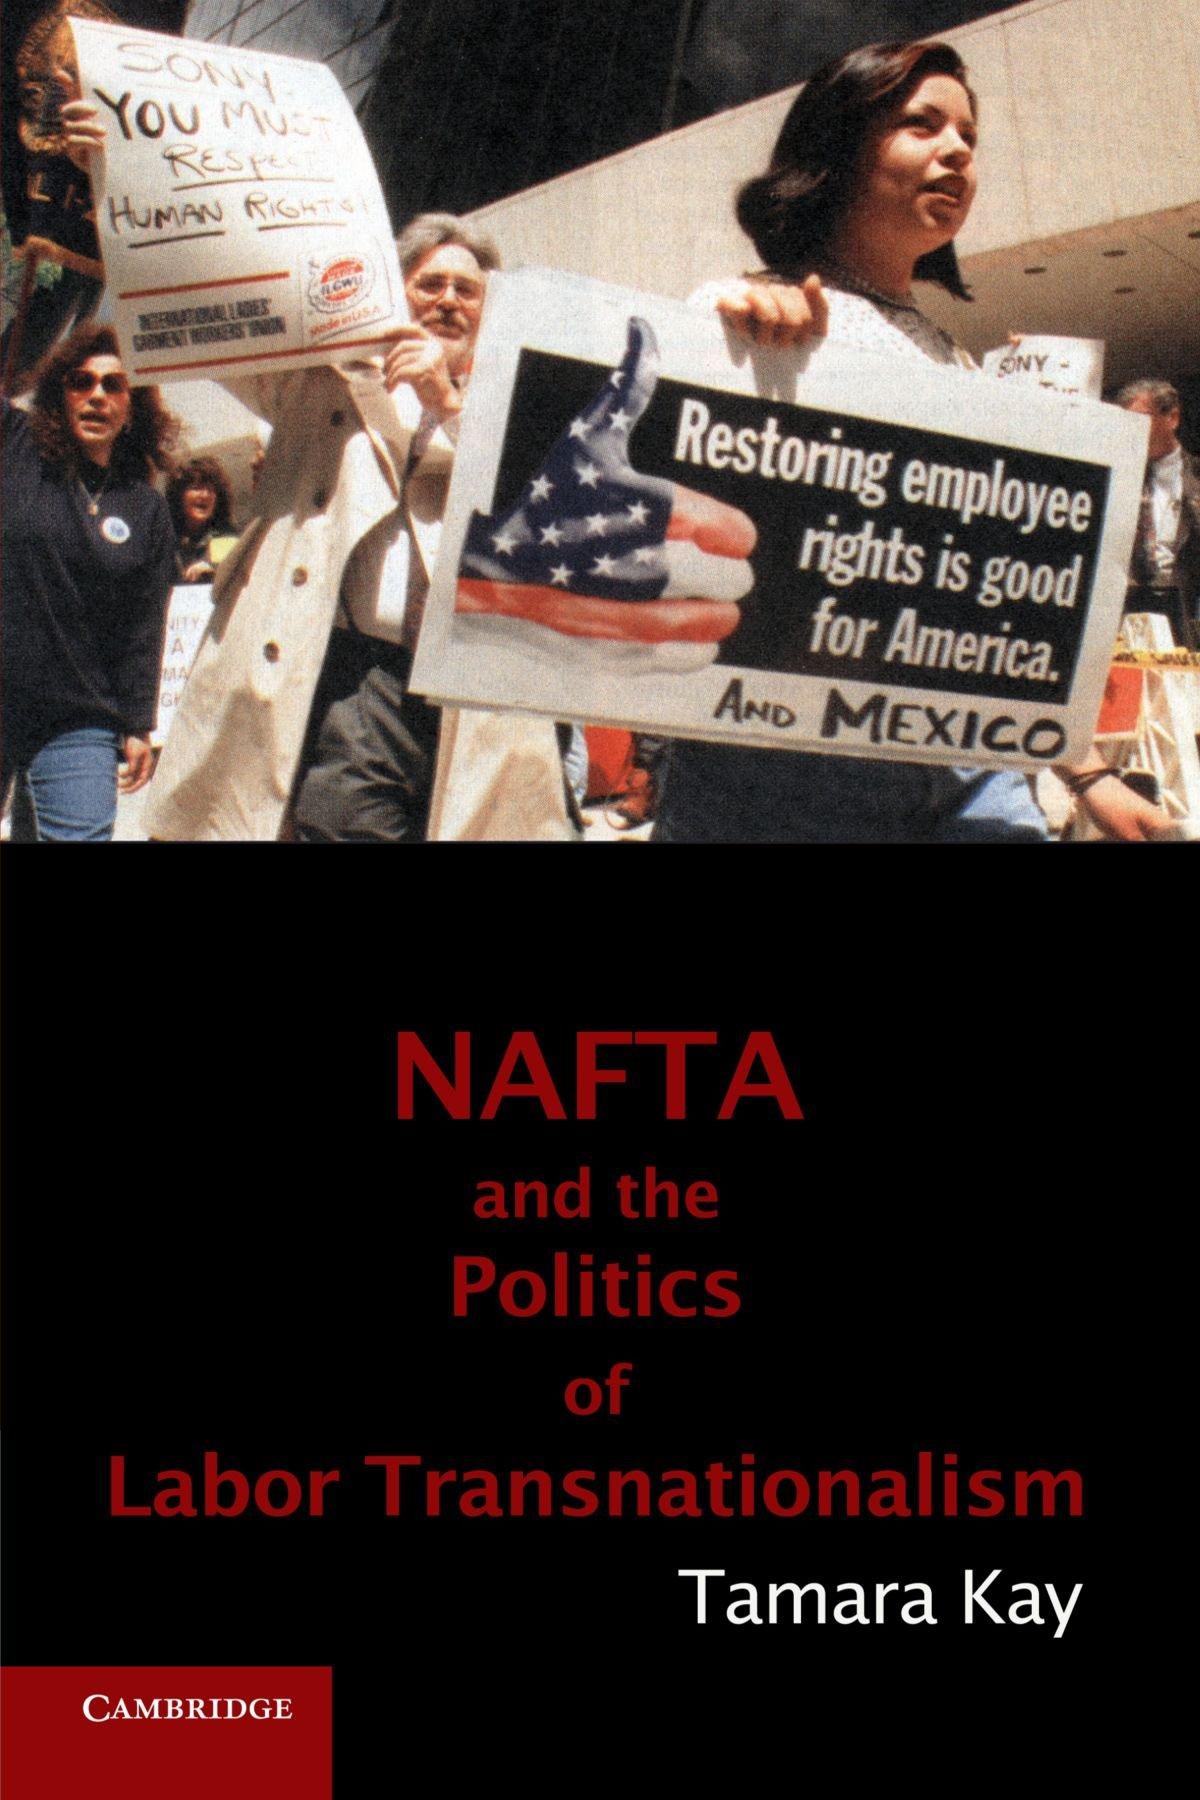 Download Nafta and the Politics of Labor Transnationalism (Cambridge Studies in Contentious Politics) pdf epub